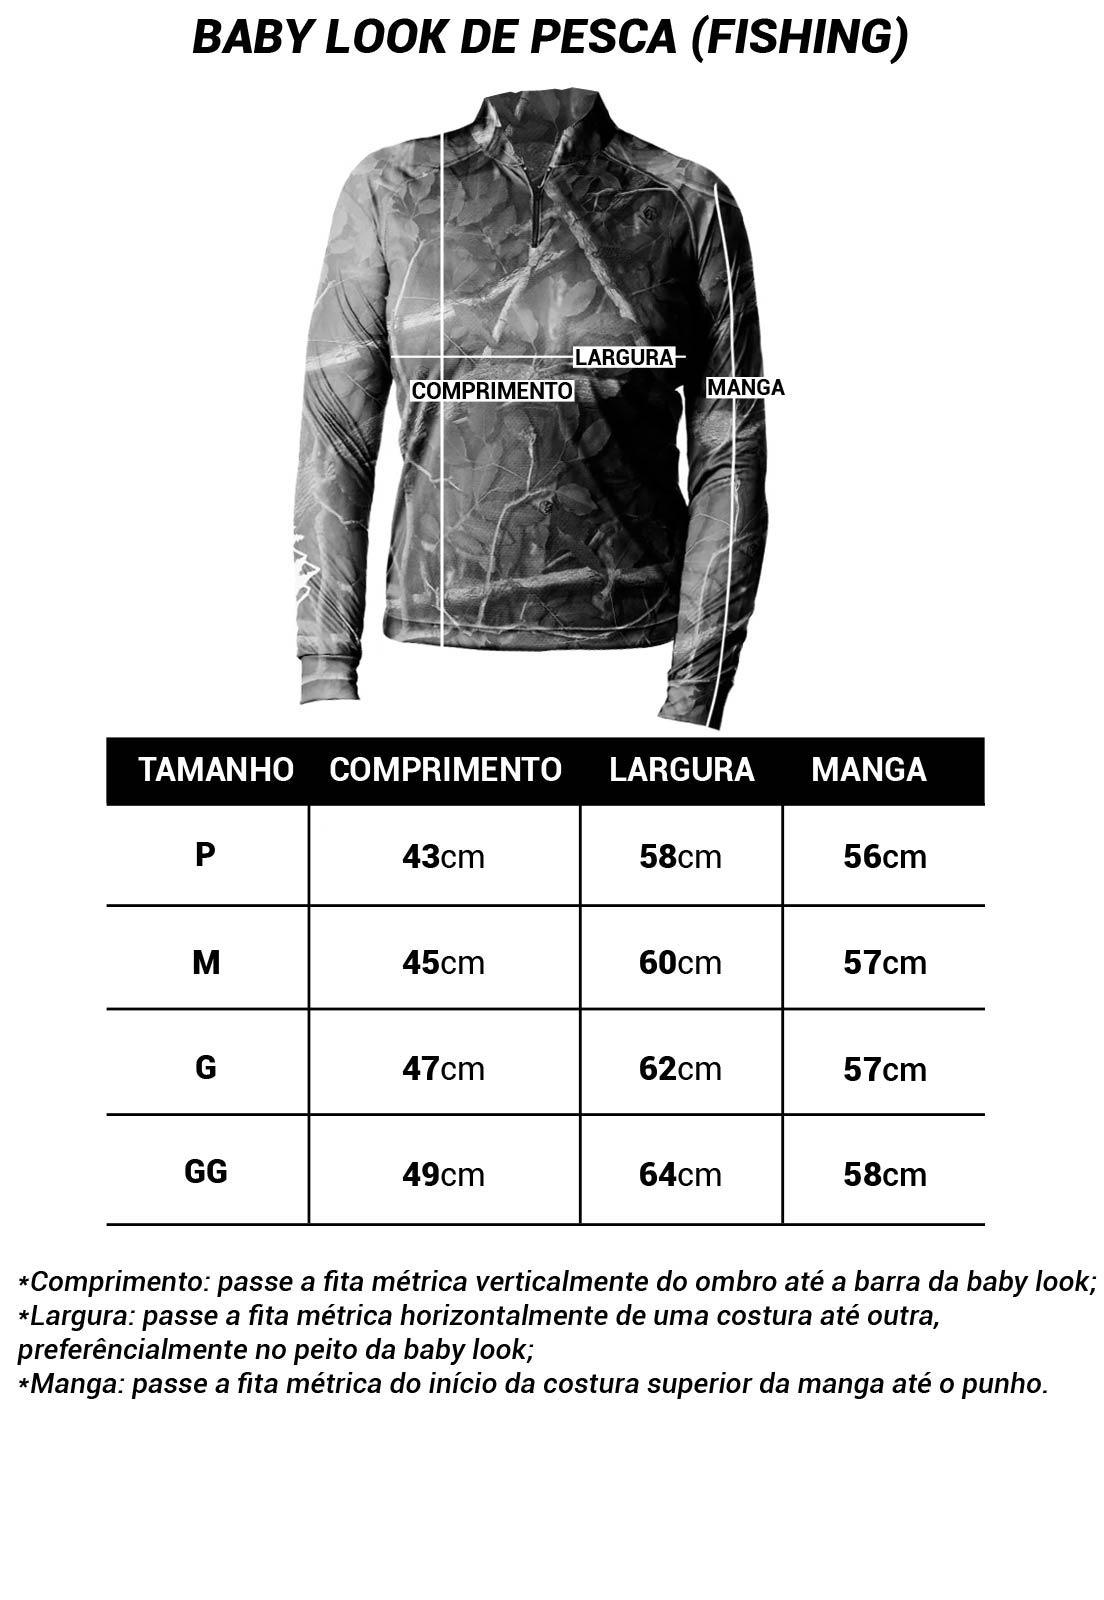 CAMISA DE PESCA FISH TECH PRO 32 FEMININA + BANDANA GRÁTIS  - Real Hunter